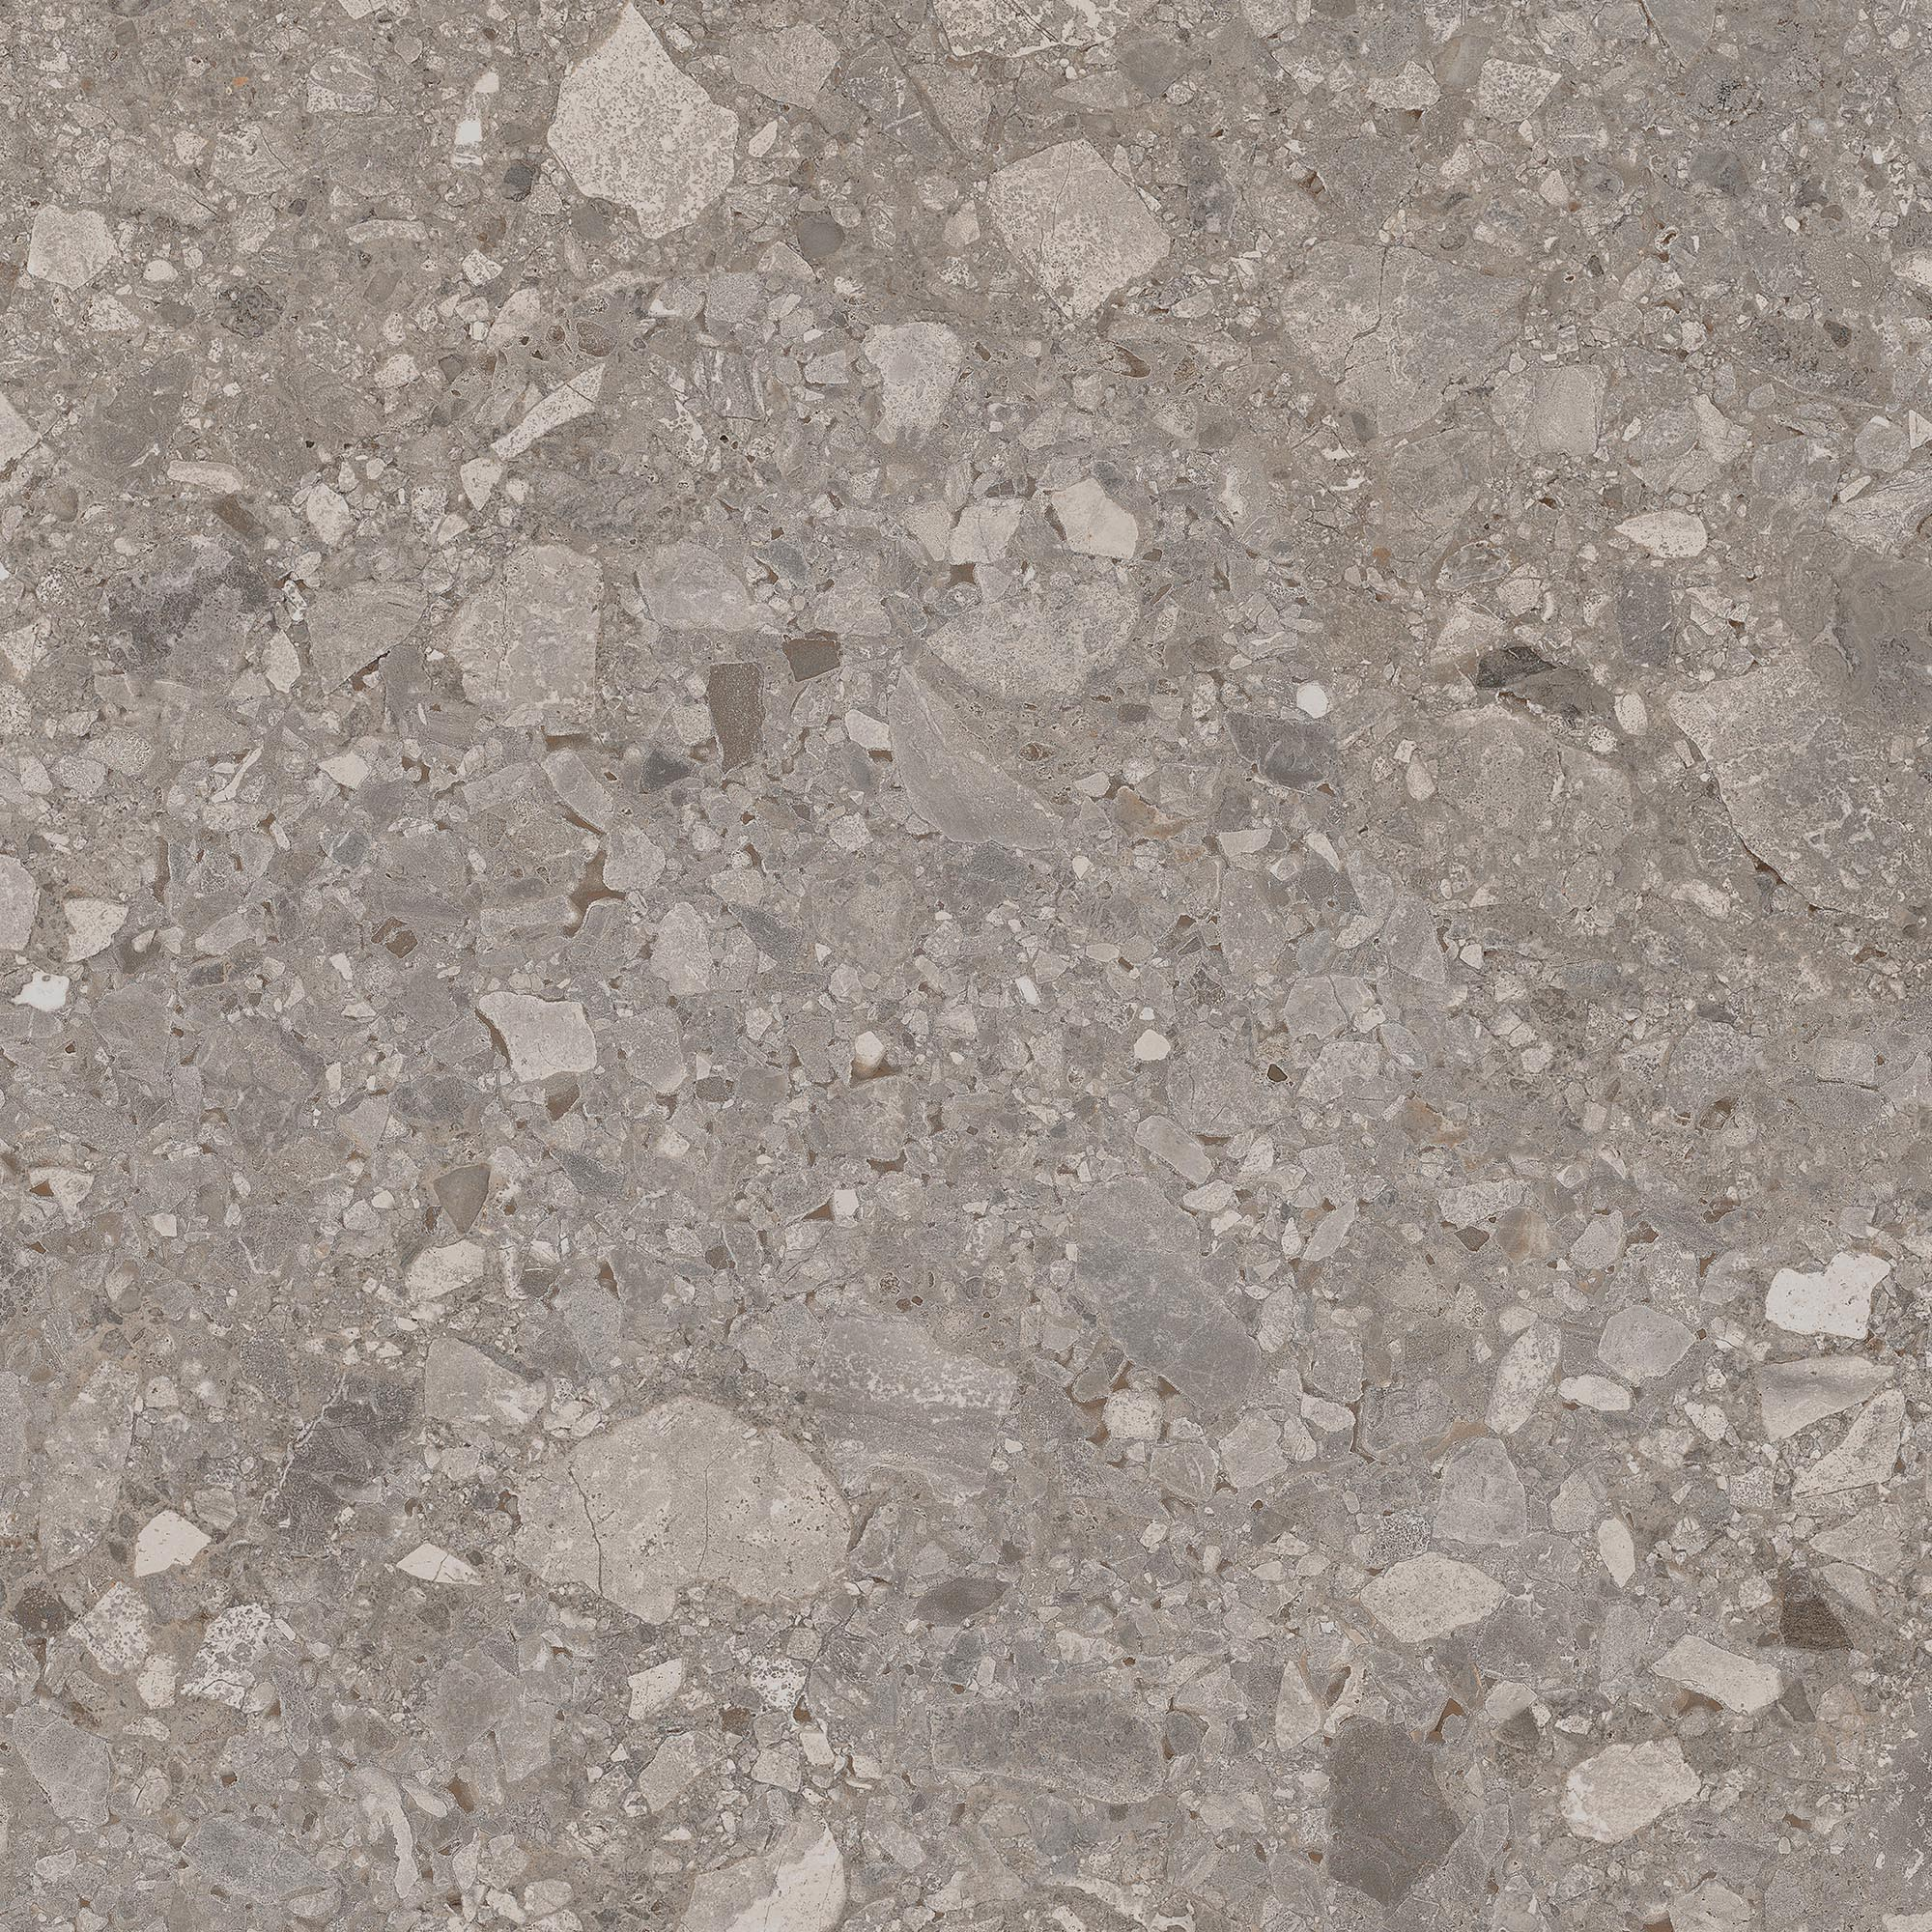 K947522R0001VTE0, Ceppostone, Beige, lattia,liukastumisenesto,pakkasenkesto